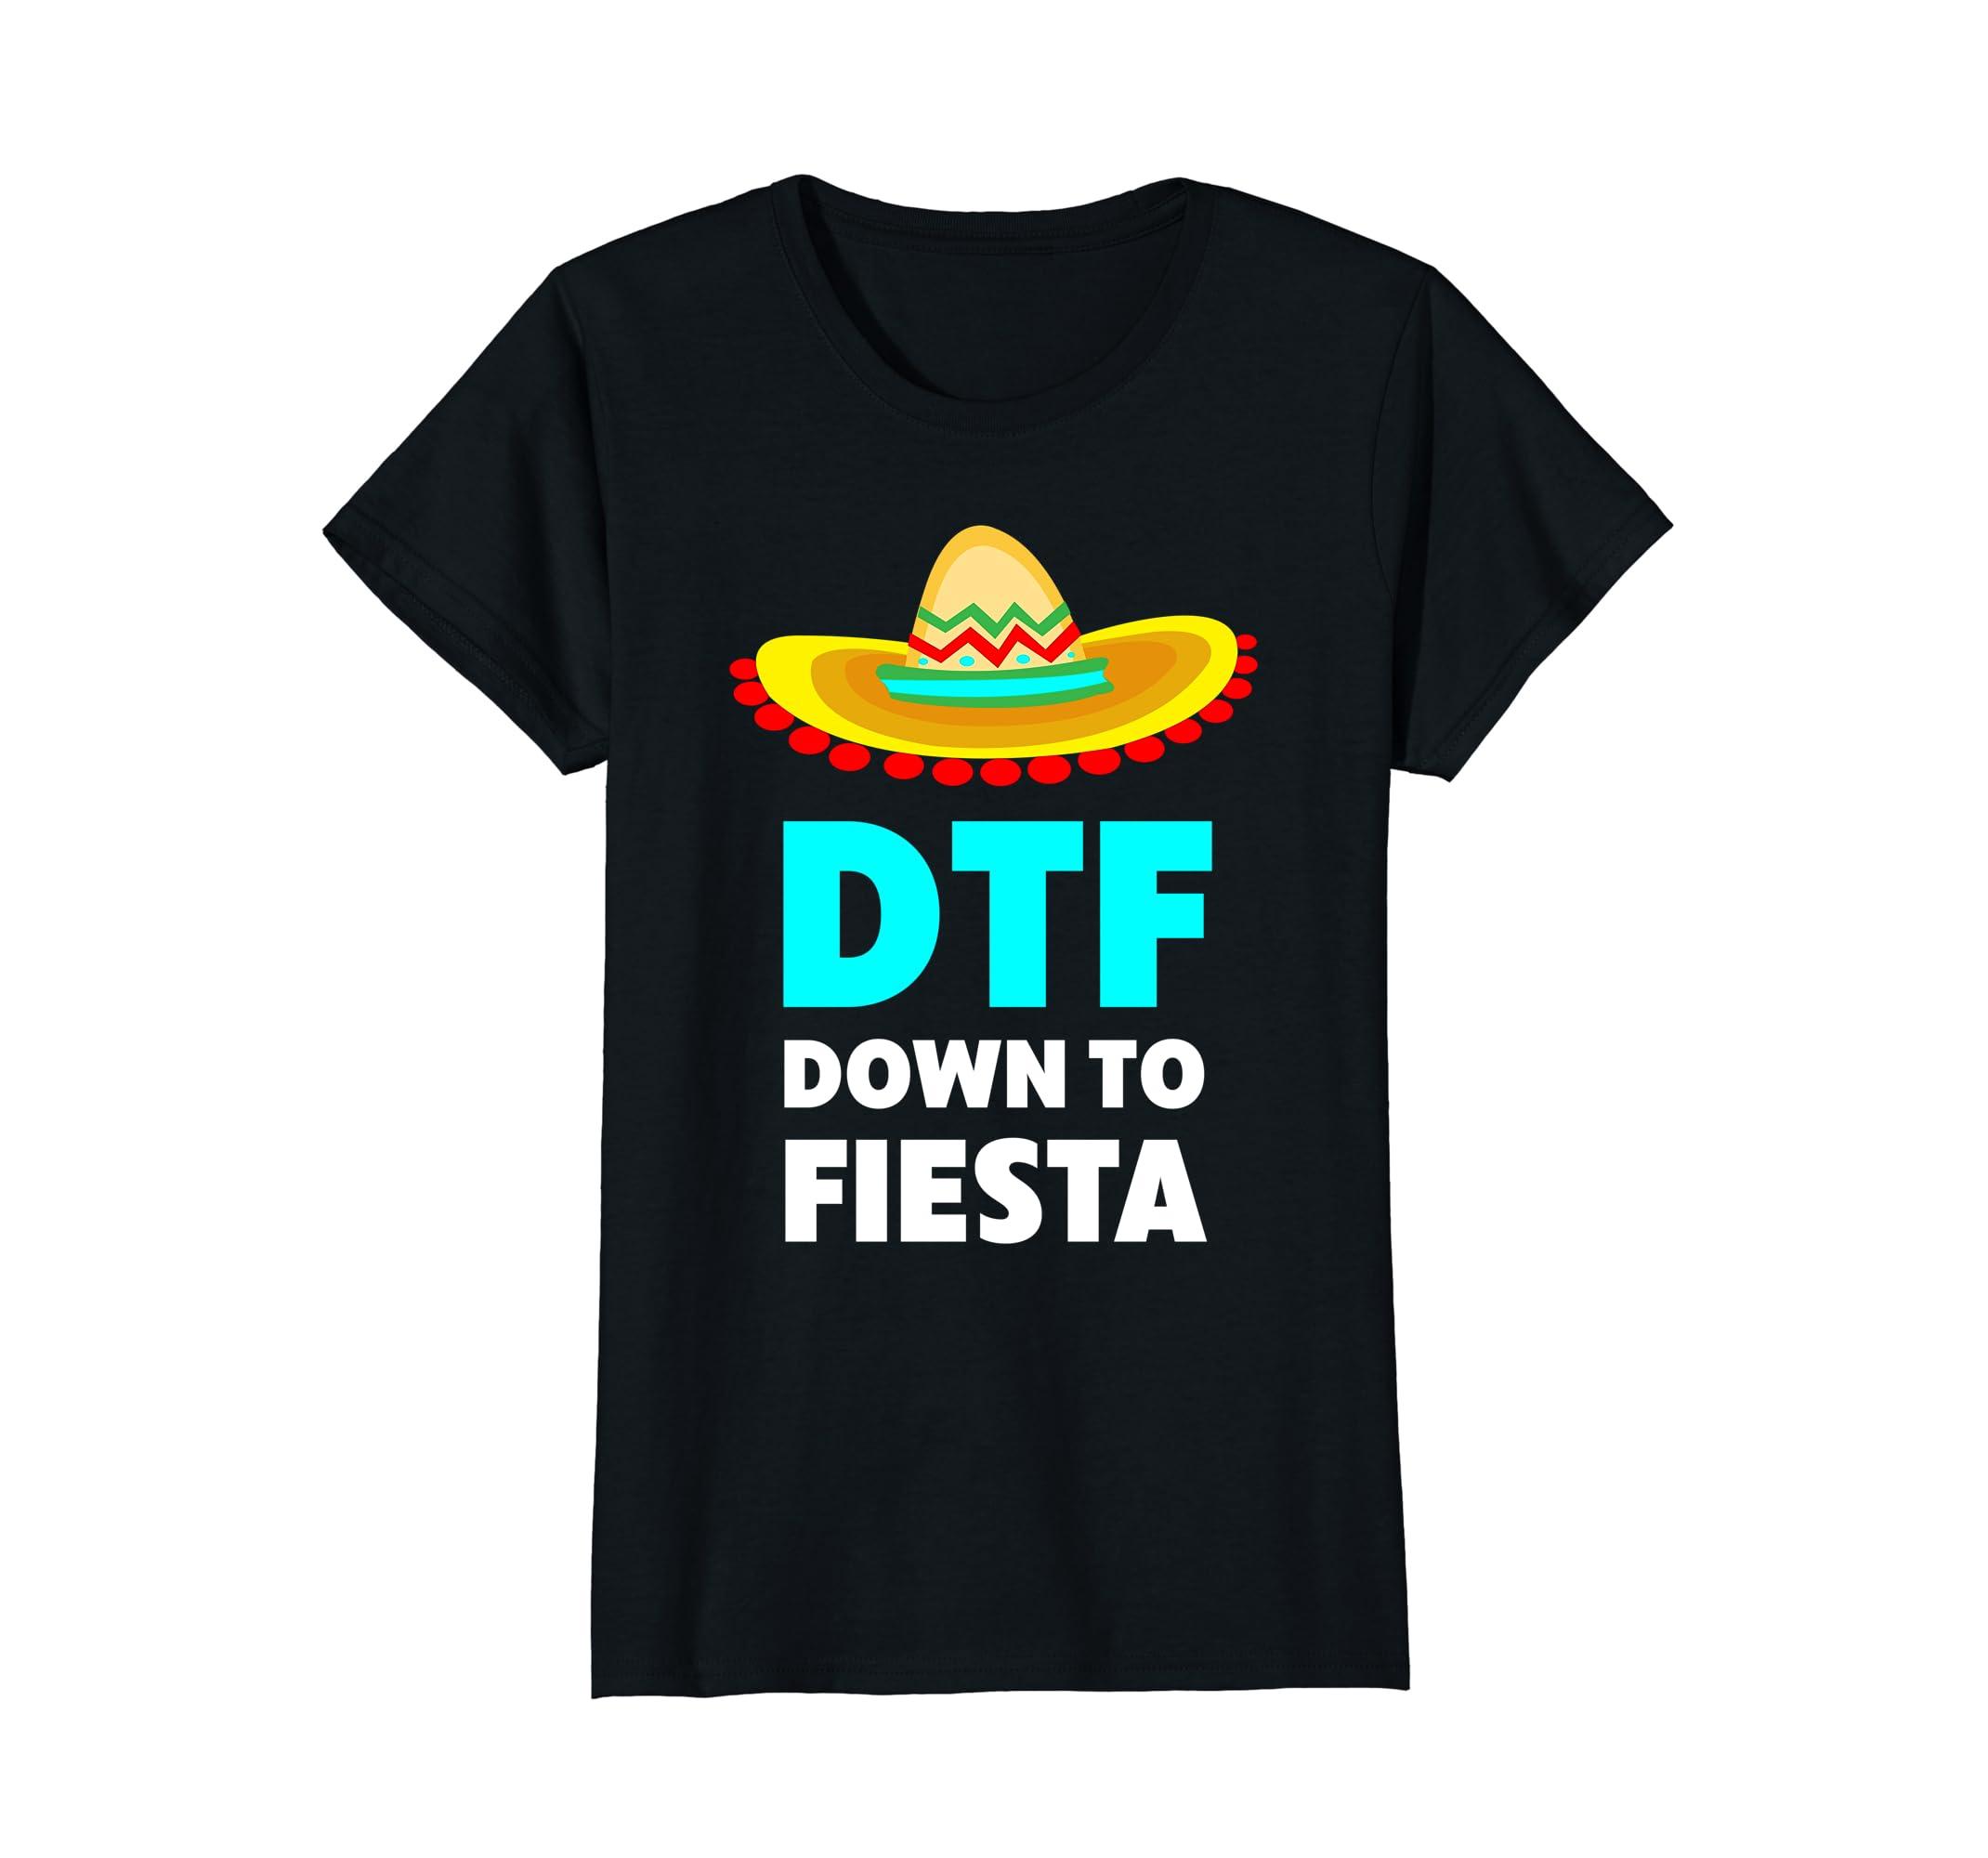 abd7a1485 Amazon.com: Down To Fiesta DTF - Funny Cinco De Mayo T-Shirt: Clothing